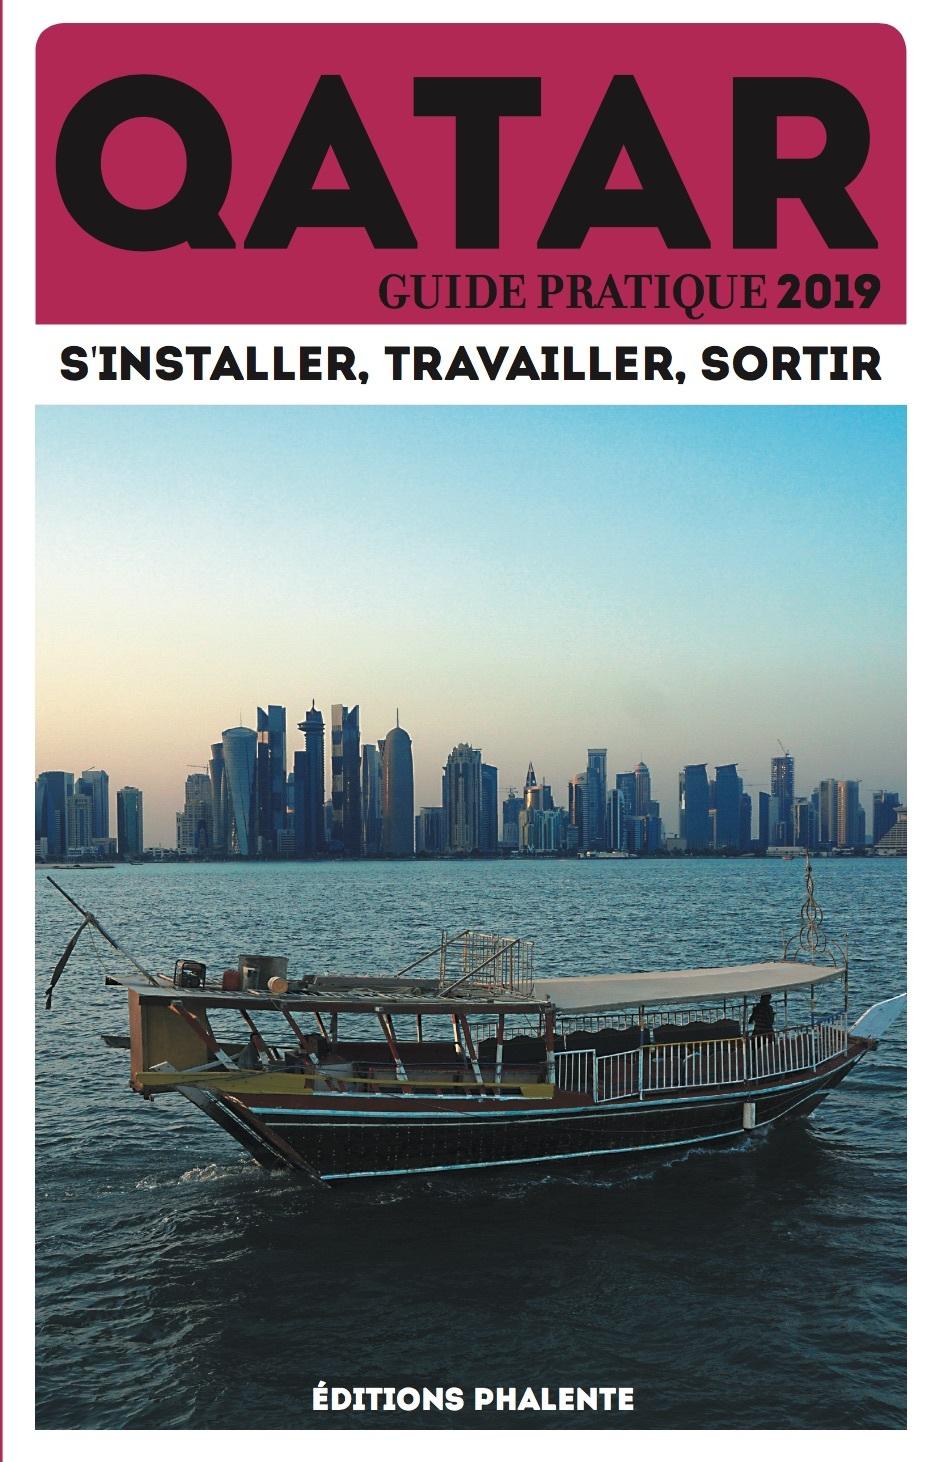 GUIDE PRATIQUE DU QATAR 2019 : S'INSTALLER, TRAVAILLER, SORTIR